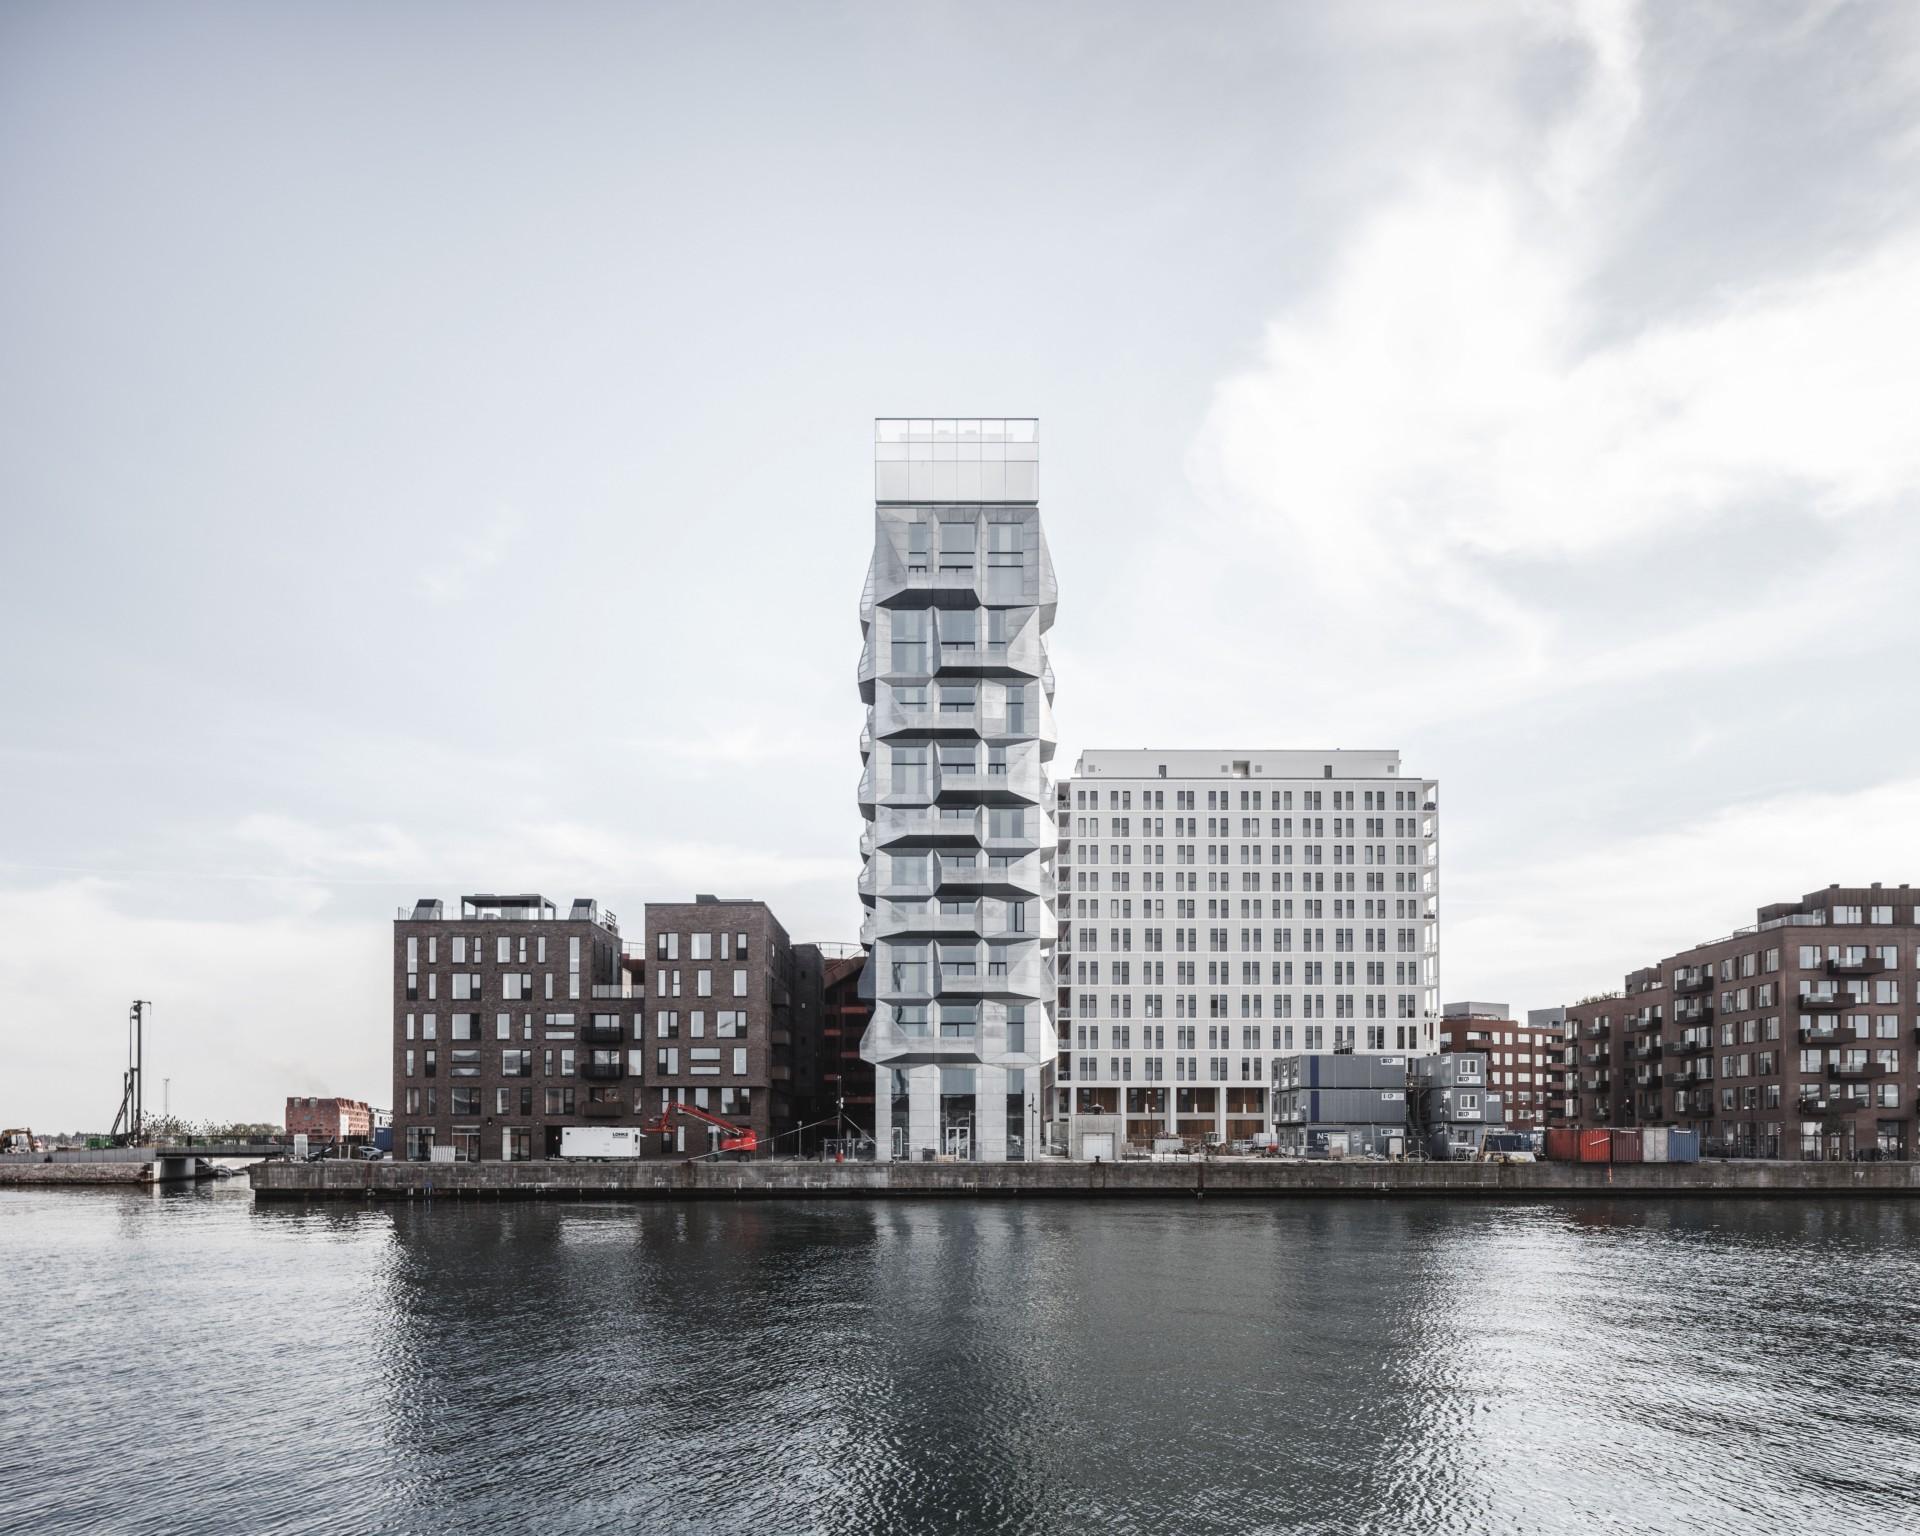 I Grattacieli più belli d'Europa al CTBUH Awards 2018